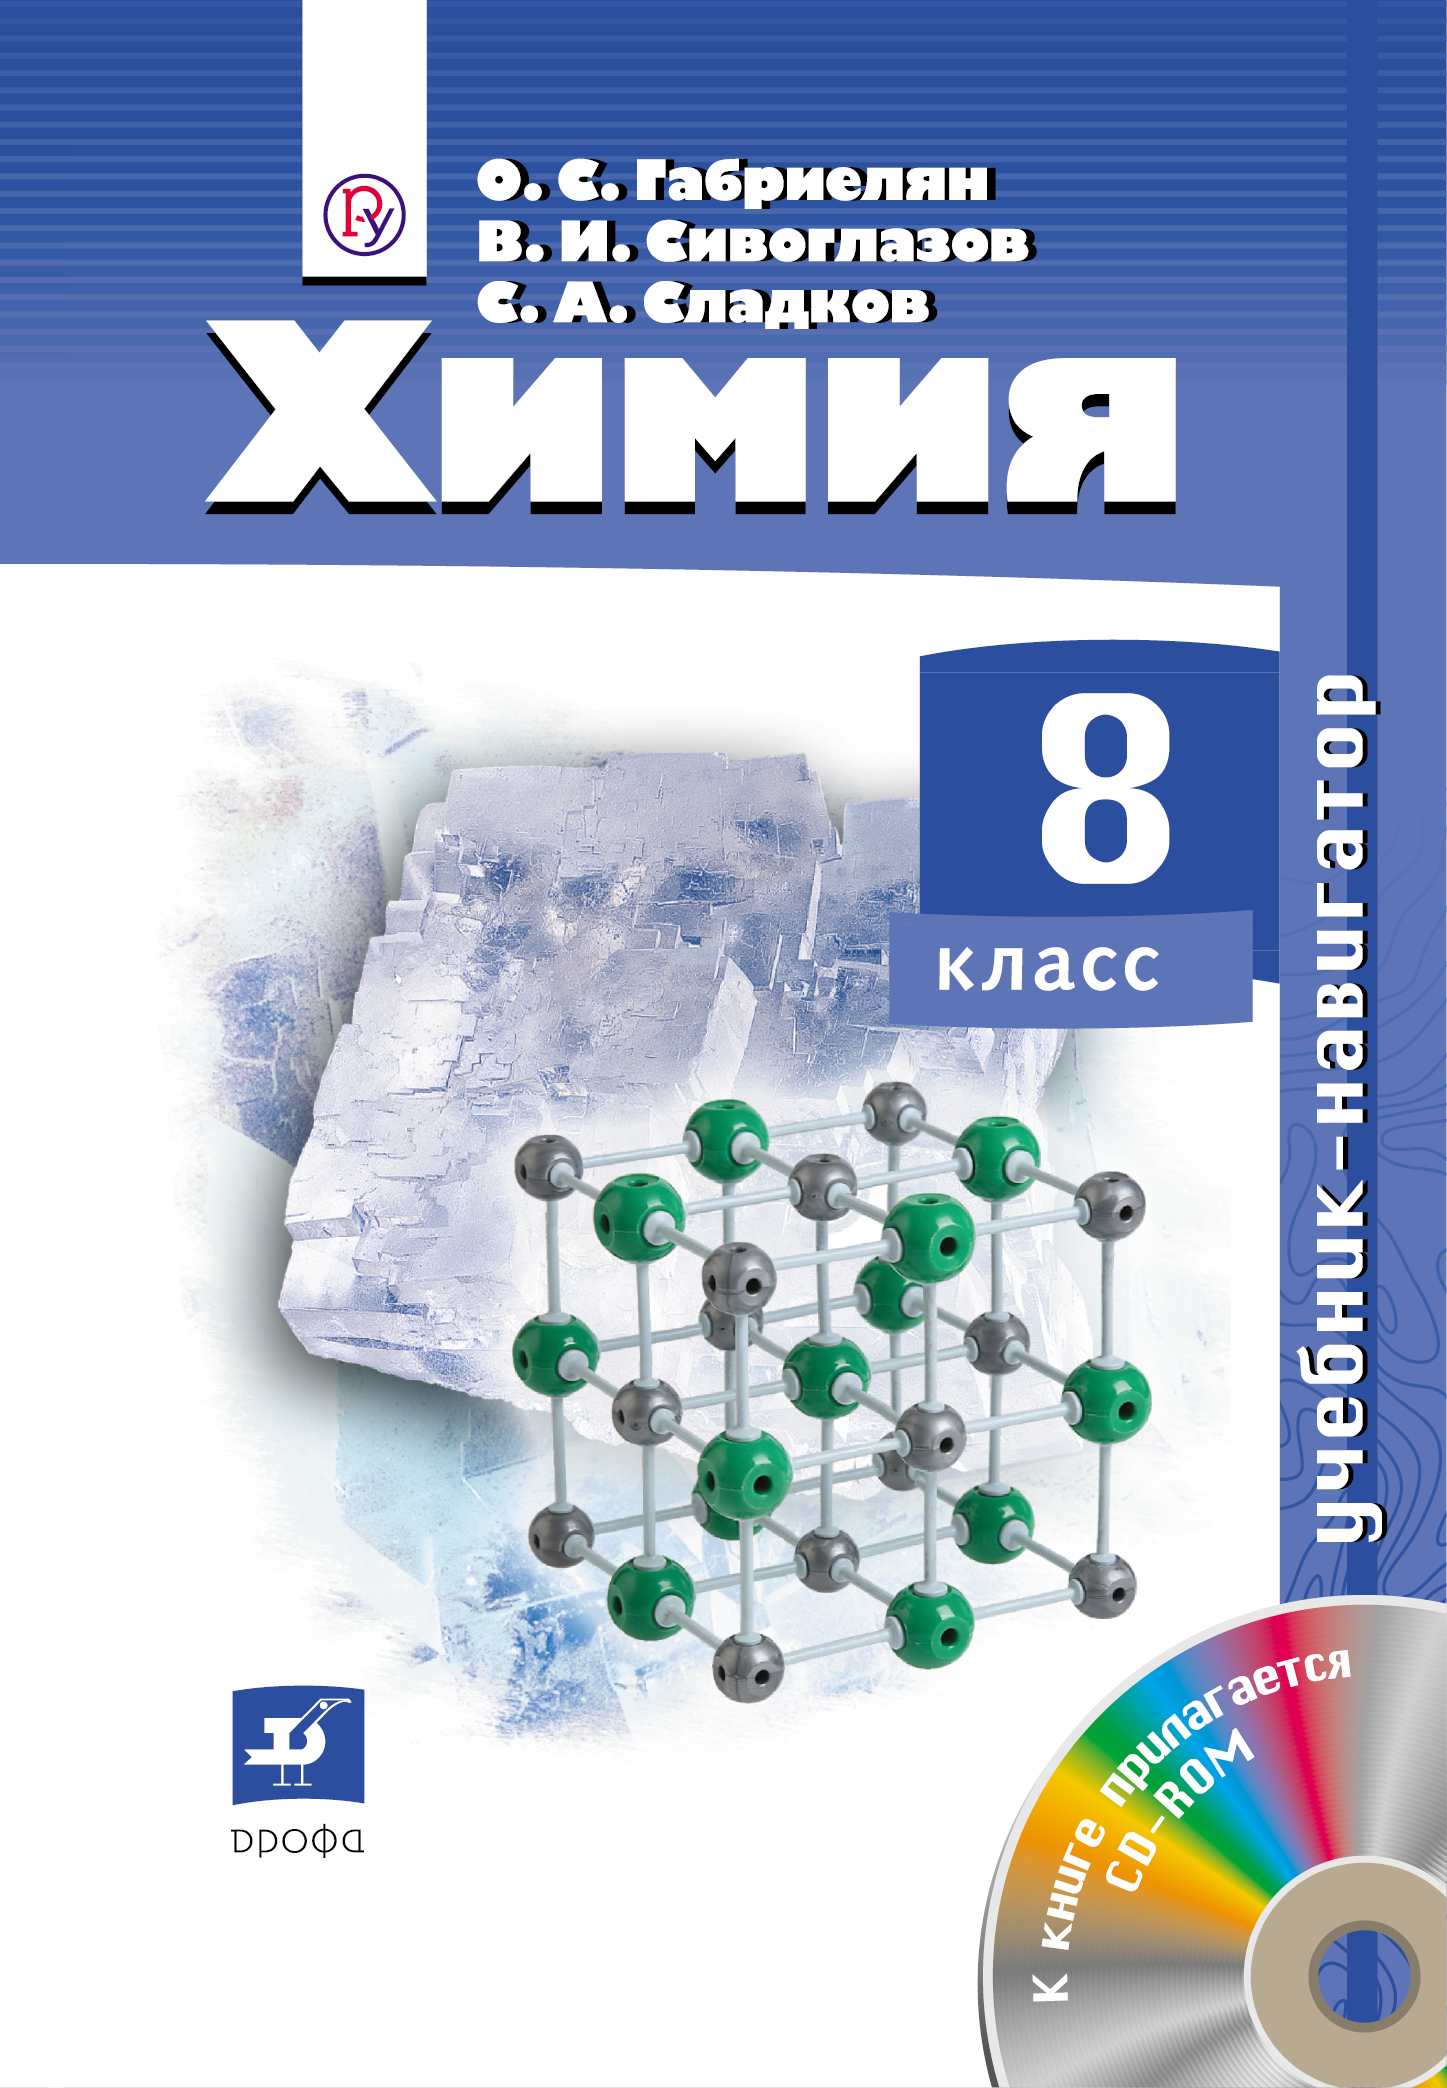 Габриелян О.С. и др. Навигатор. Химия. 8 класс. Учебник + CD от book24.ru